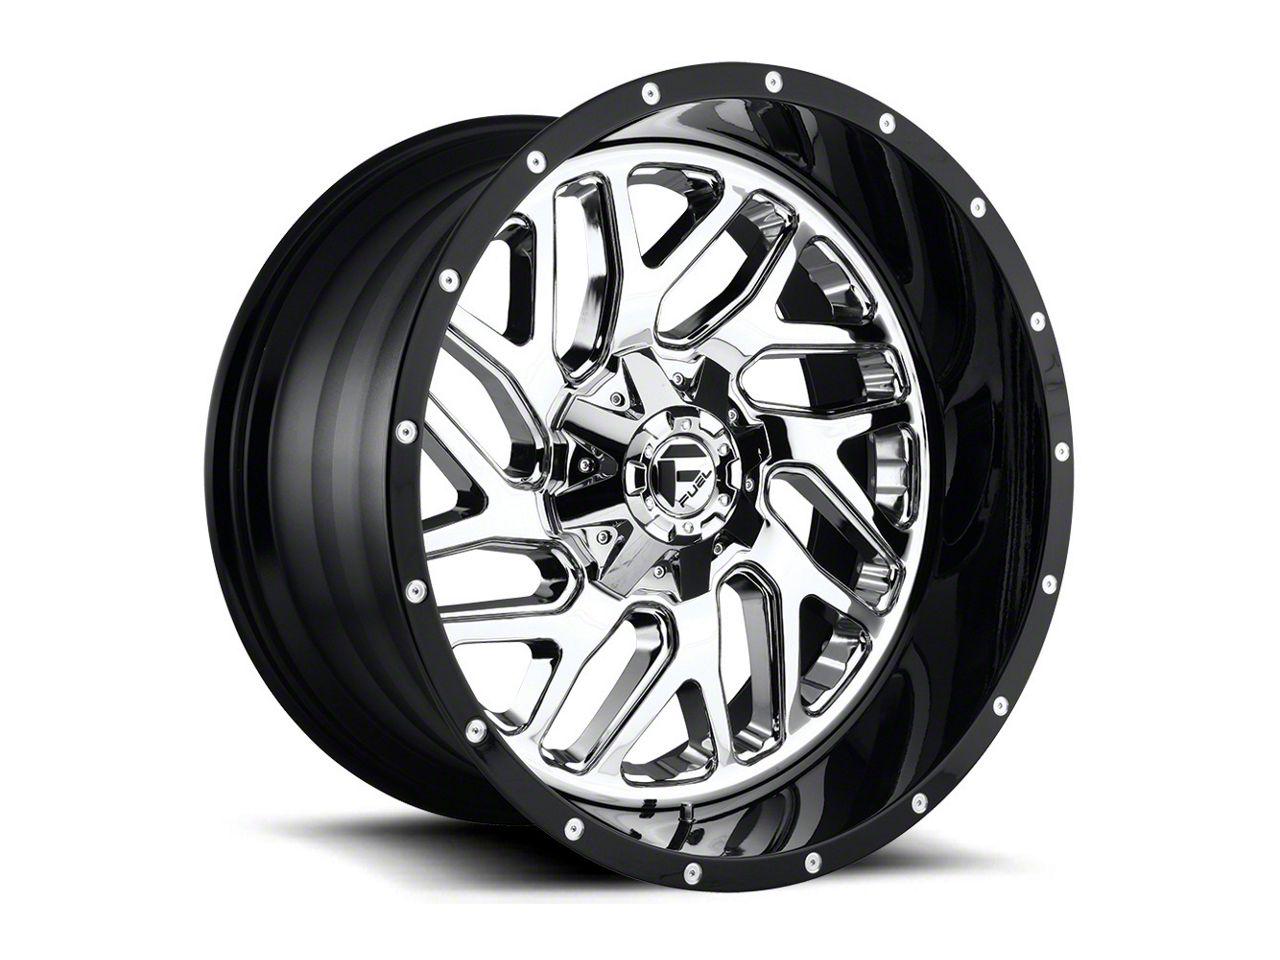 Fuel Wheels Triton Chrome 6-Lug Wheel - 22x14 (07-18 Sierra 1500)